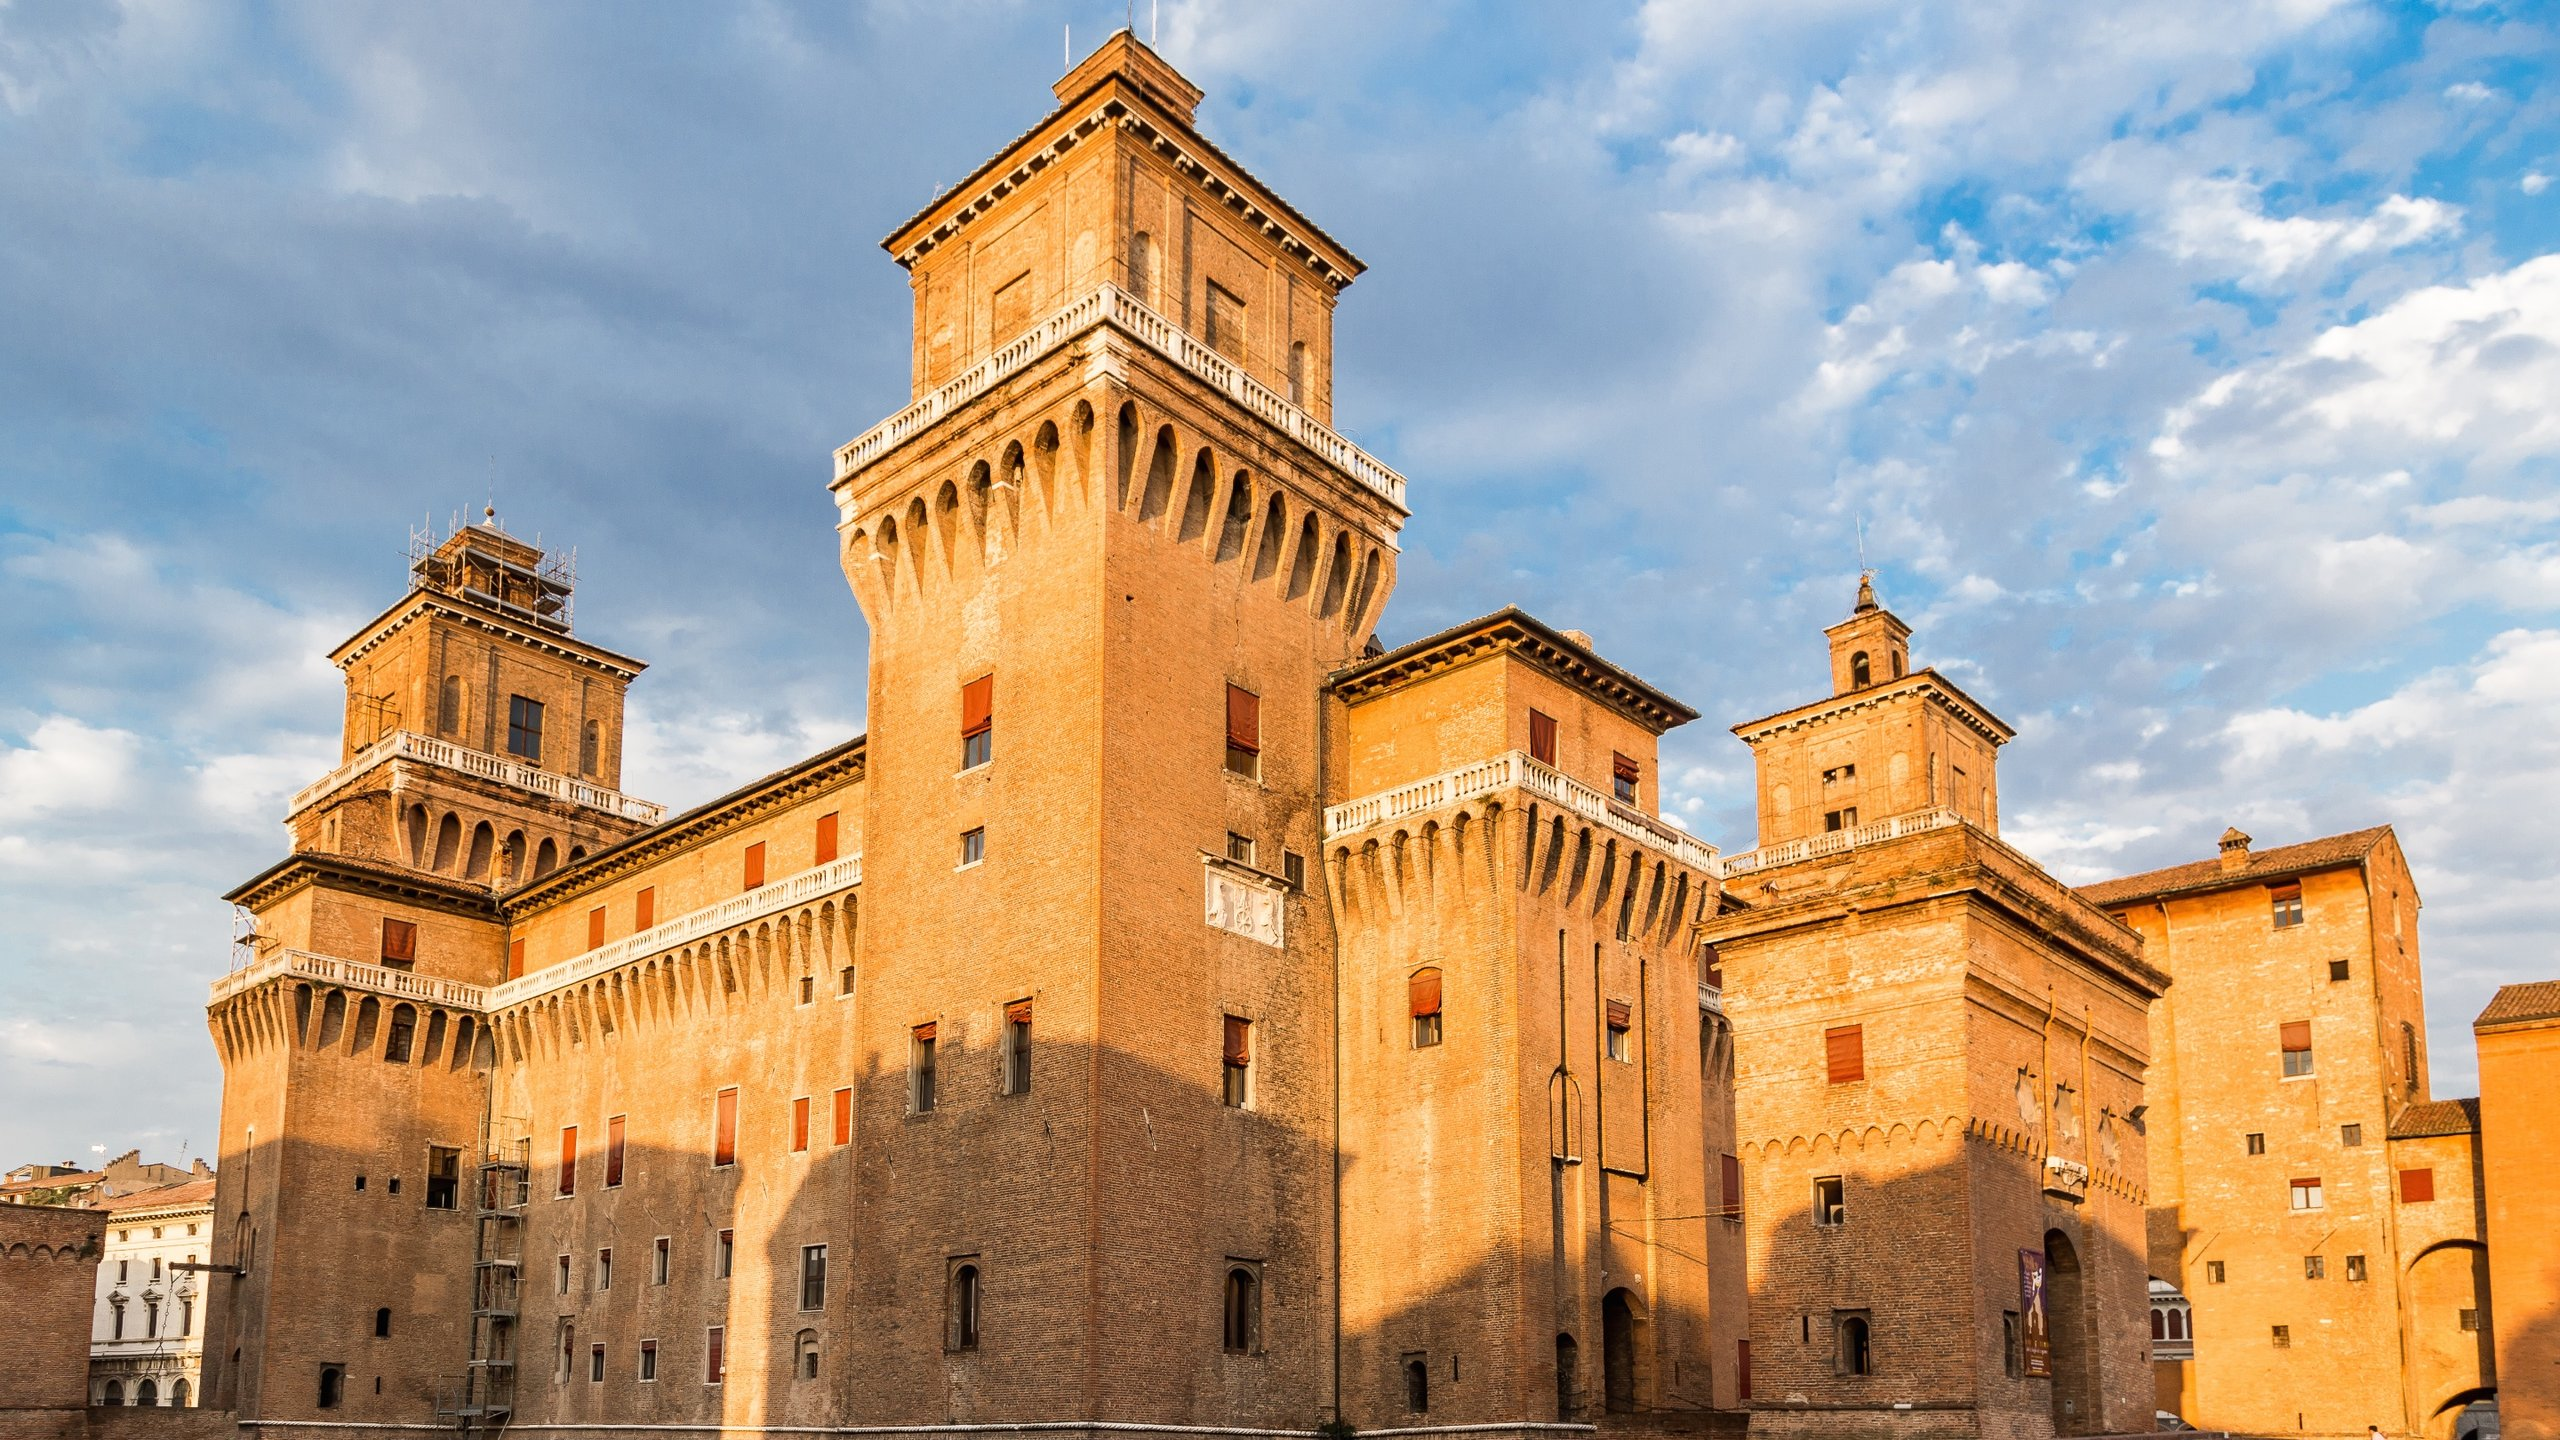 Province of Ferrara, Emilia-Romagna, Italy